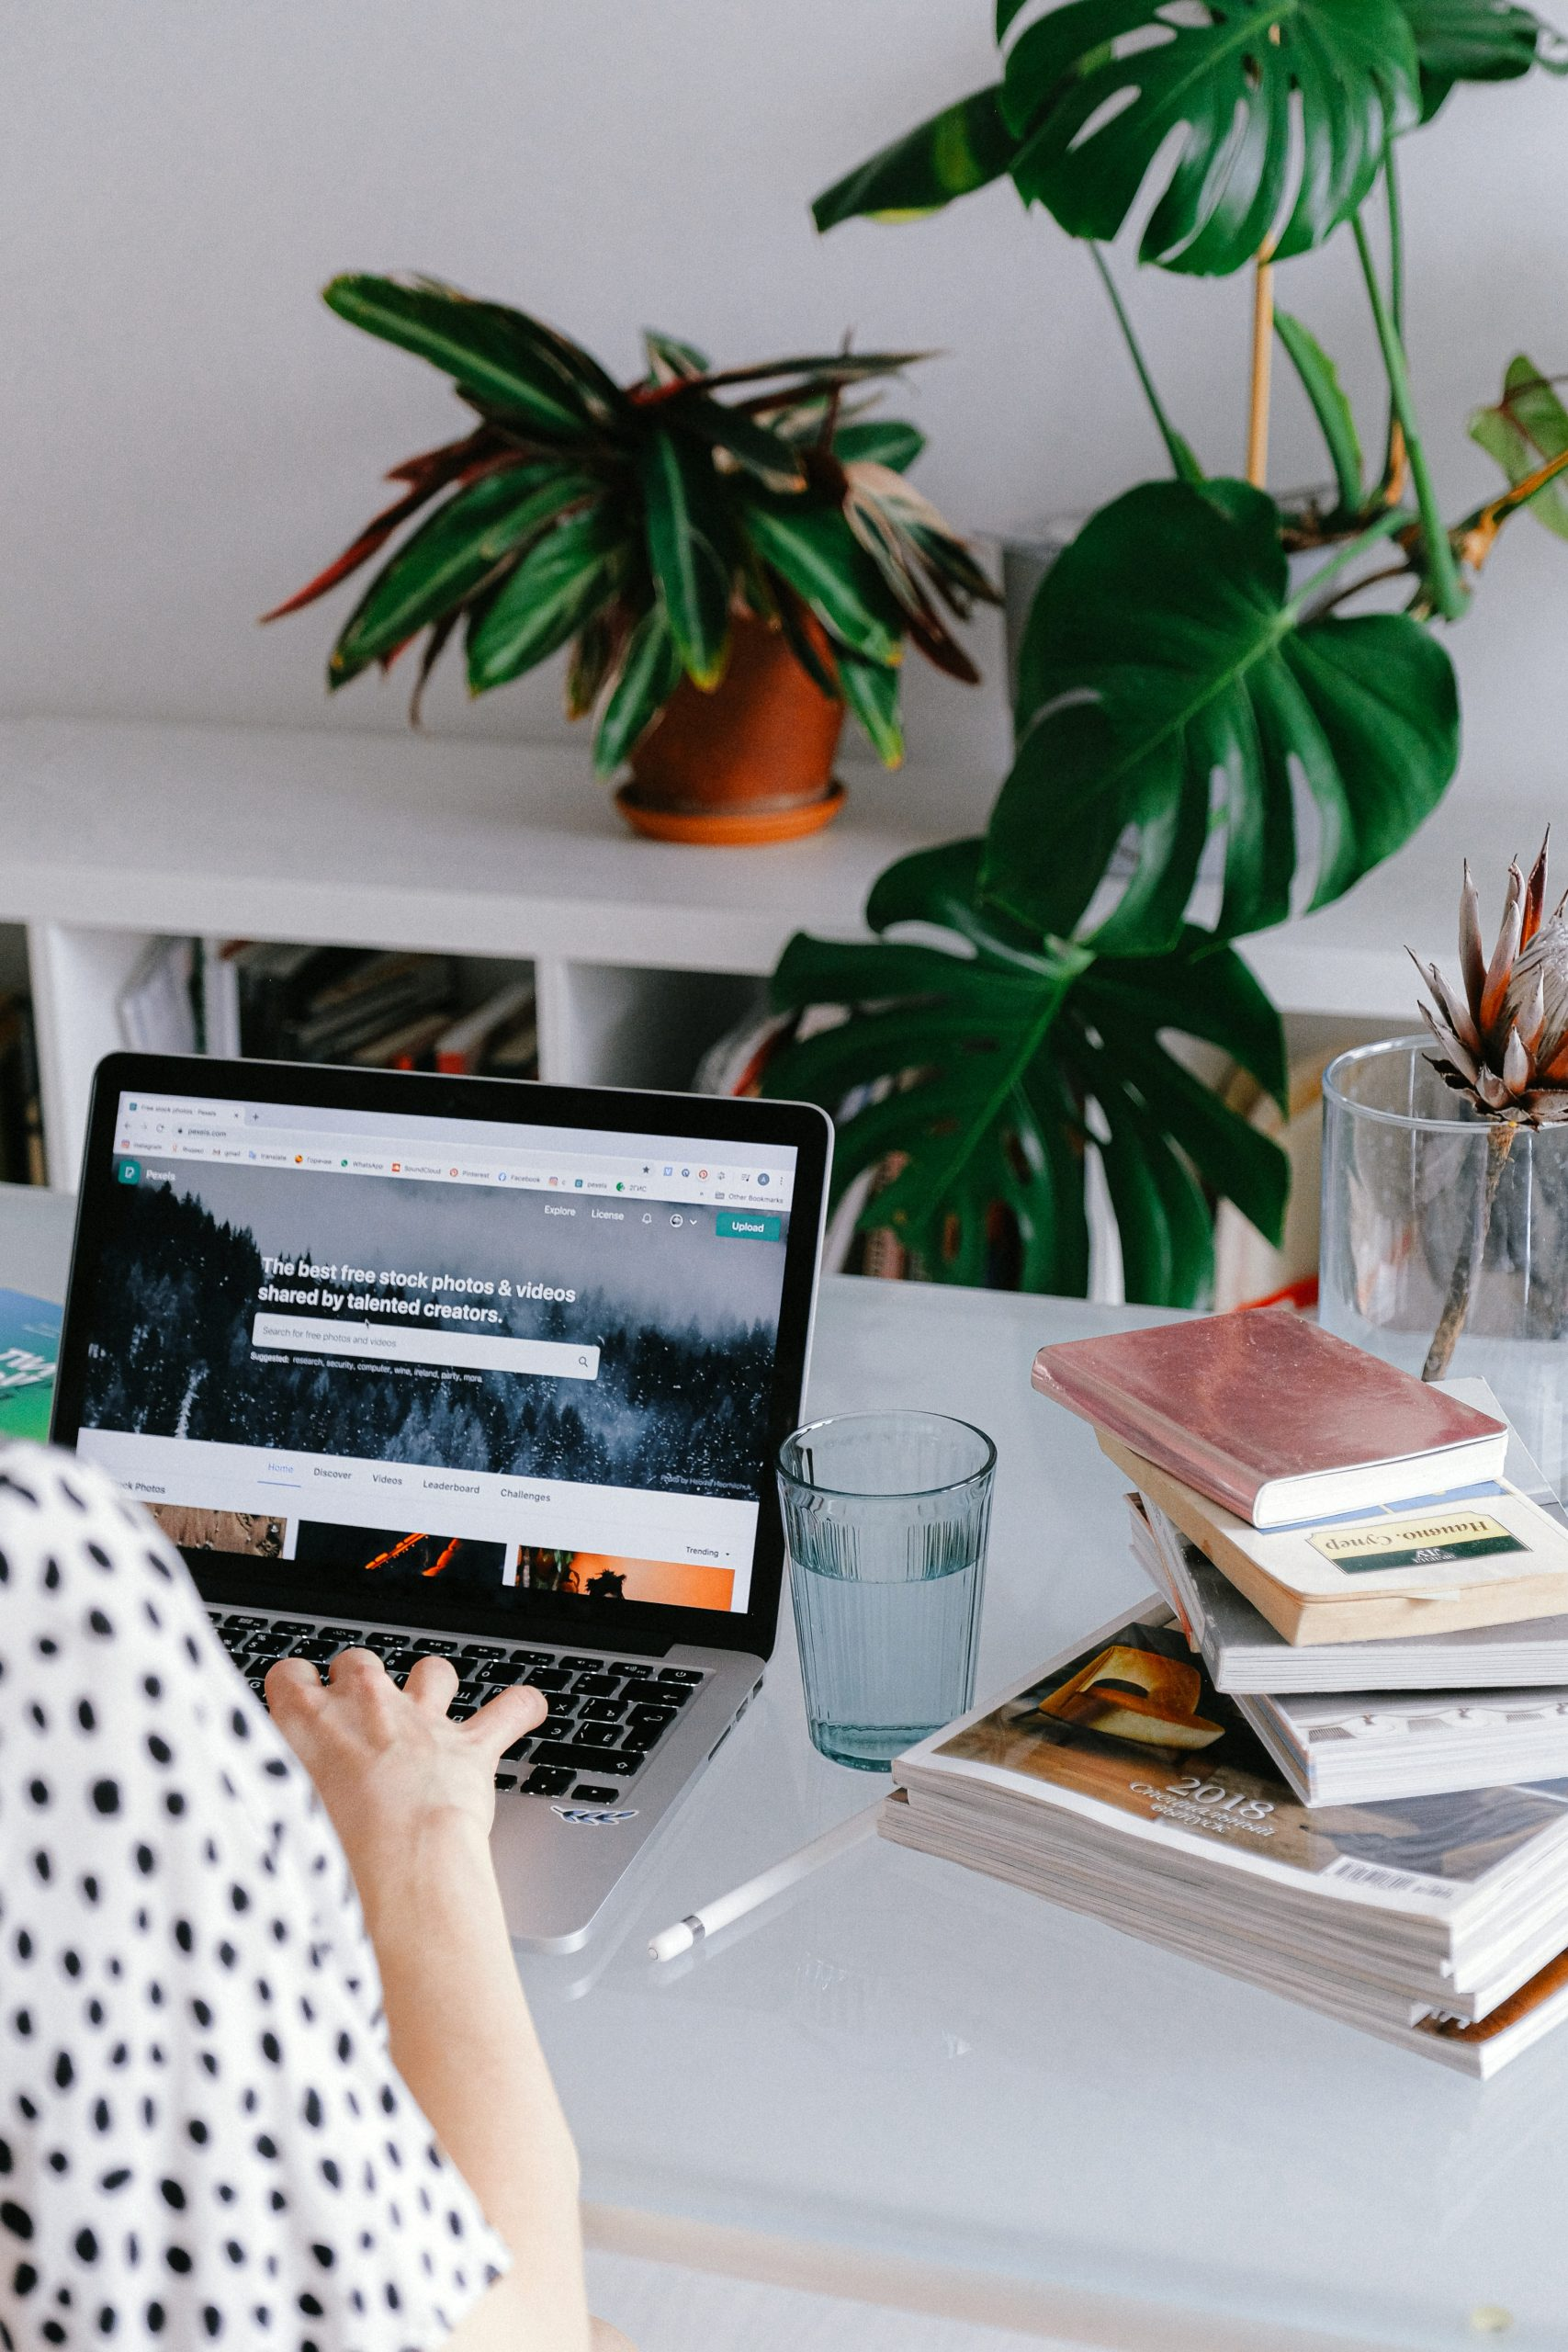 5 Ways Employers can Encourage a Healthy Work-Life Balance